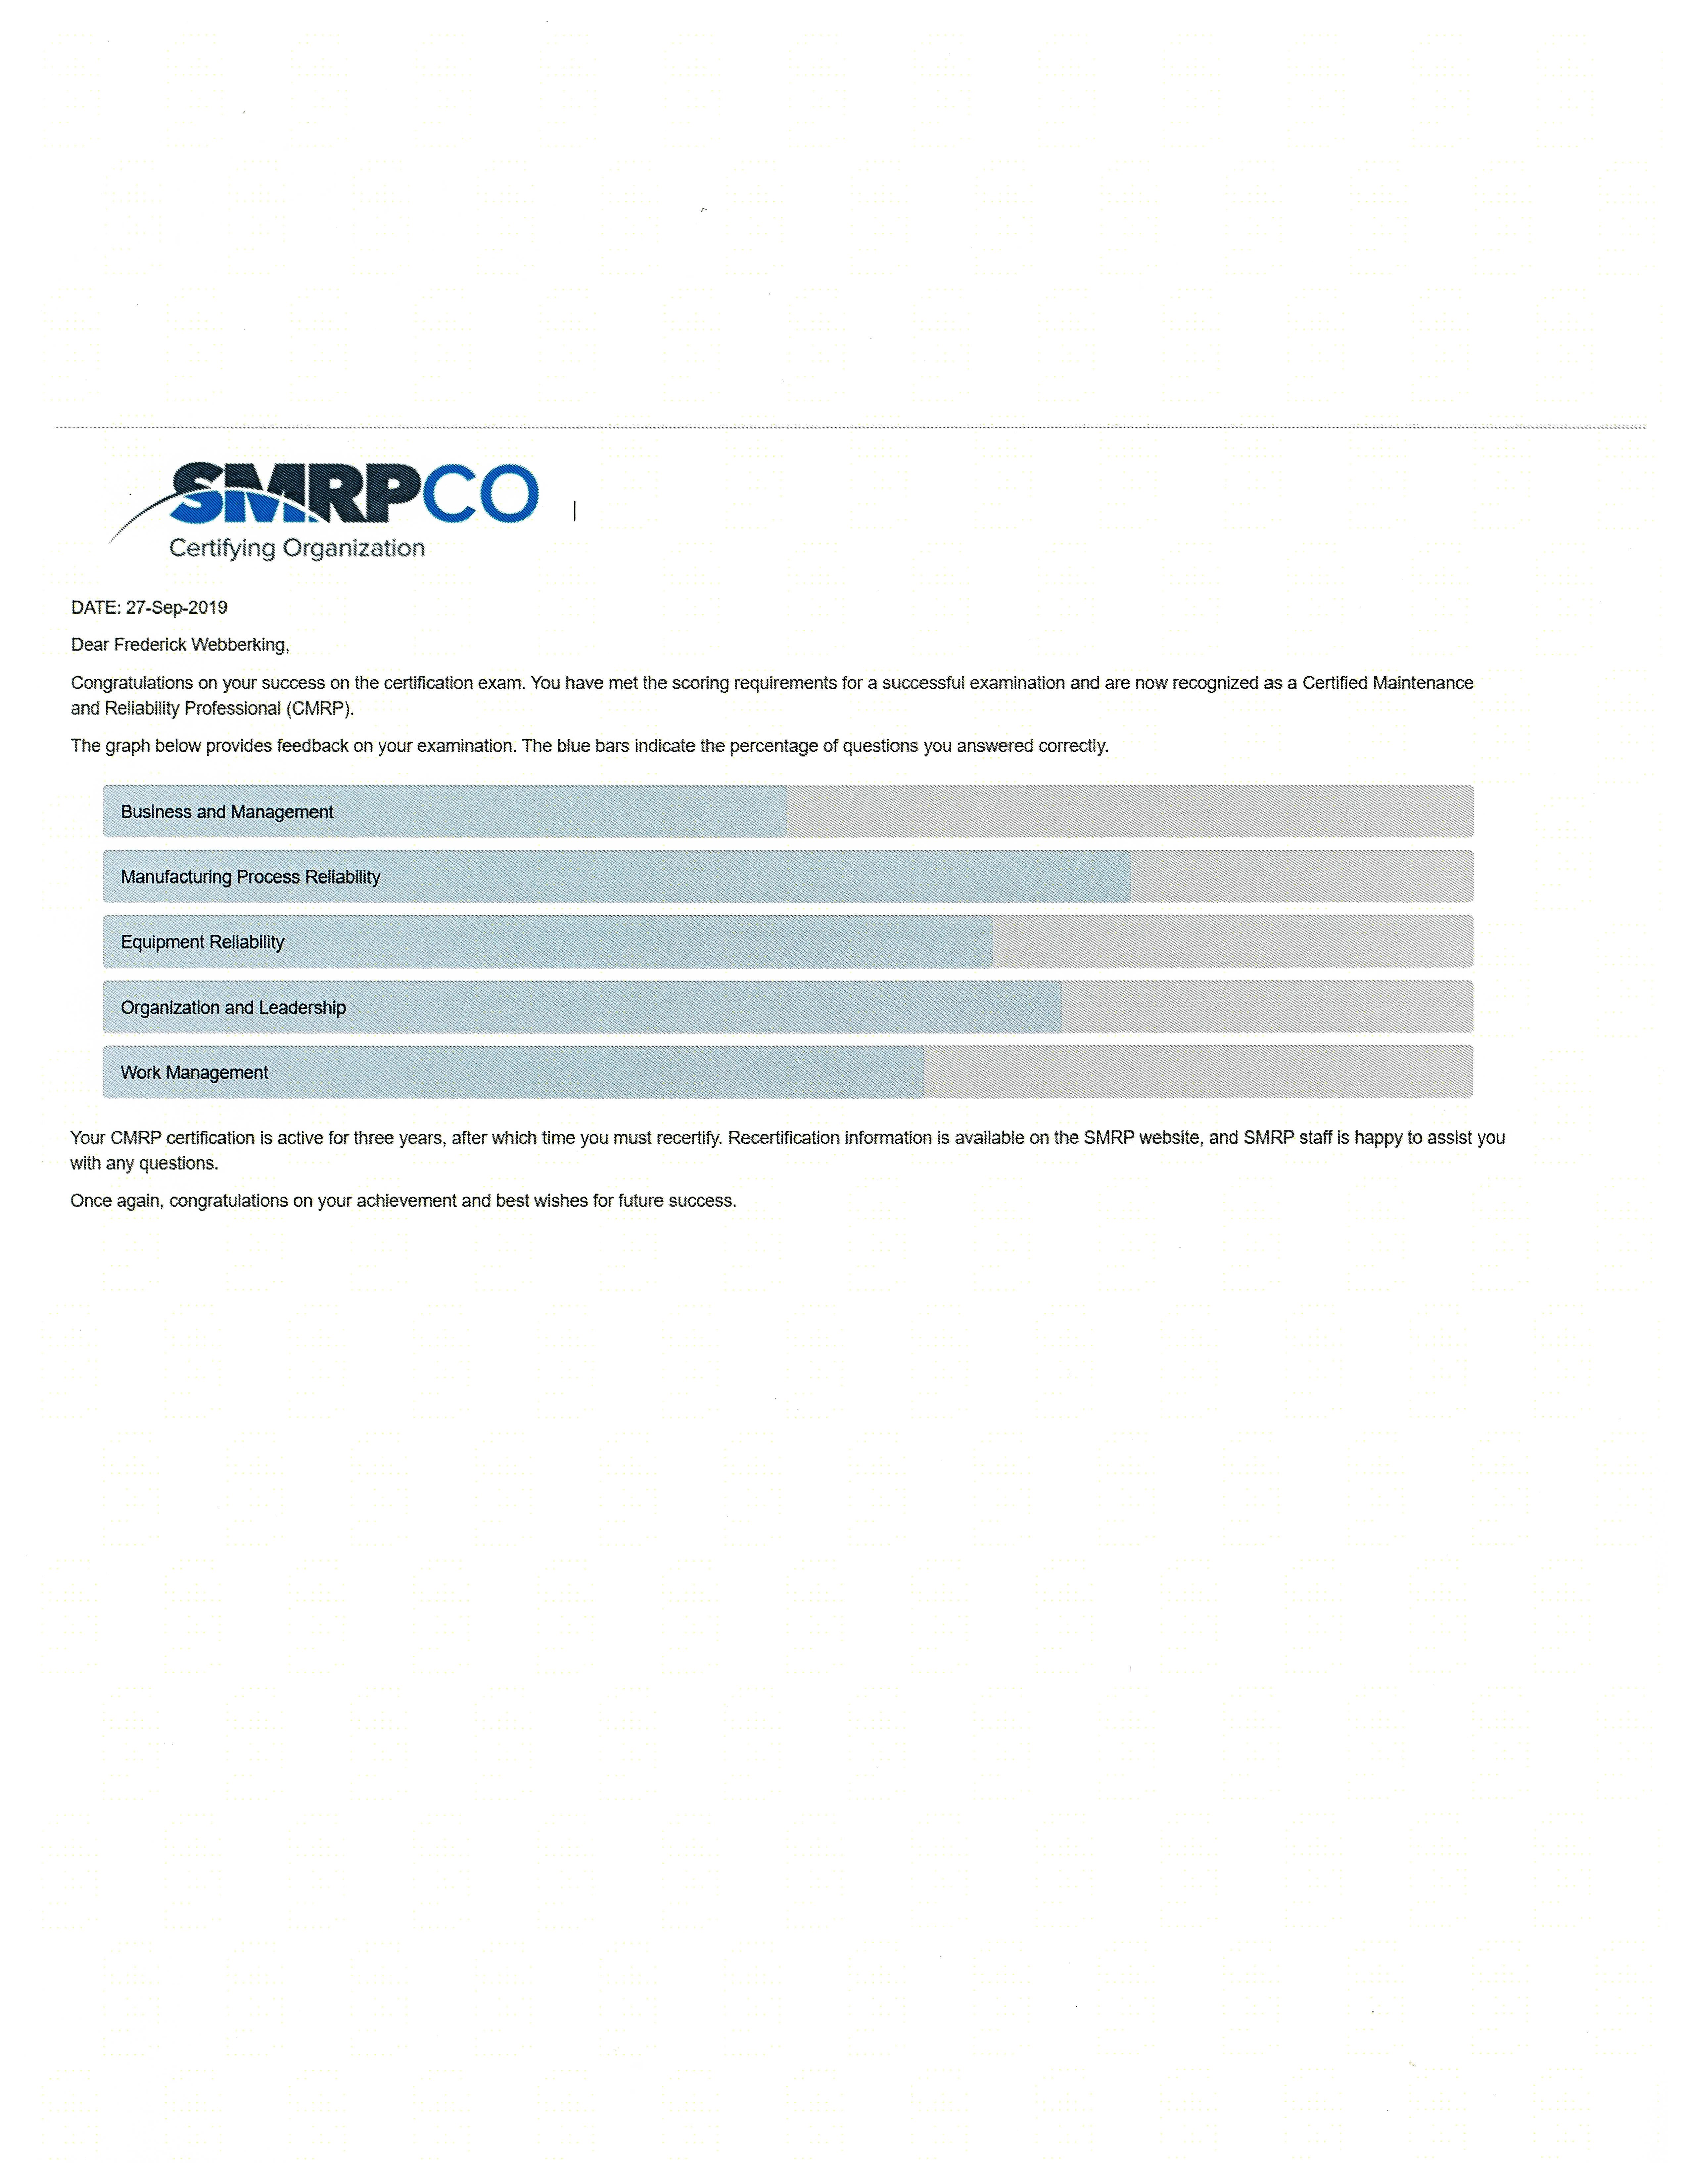 Reference Letter - SMRP - SMRPCO